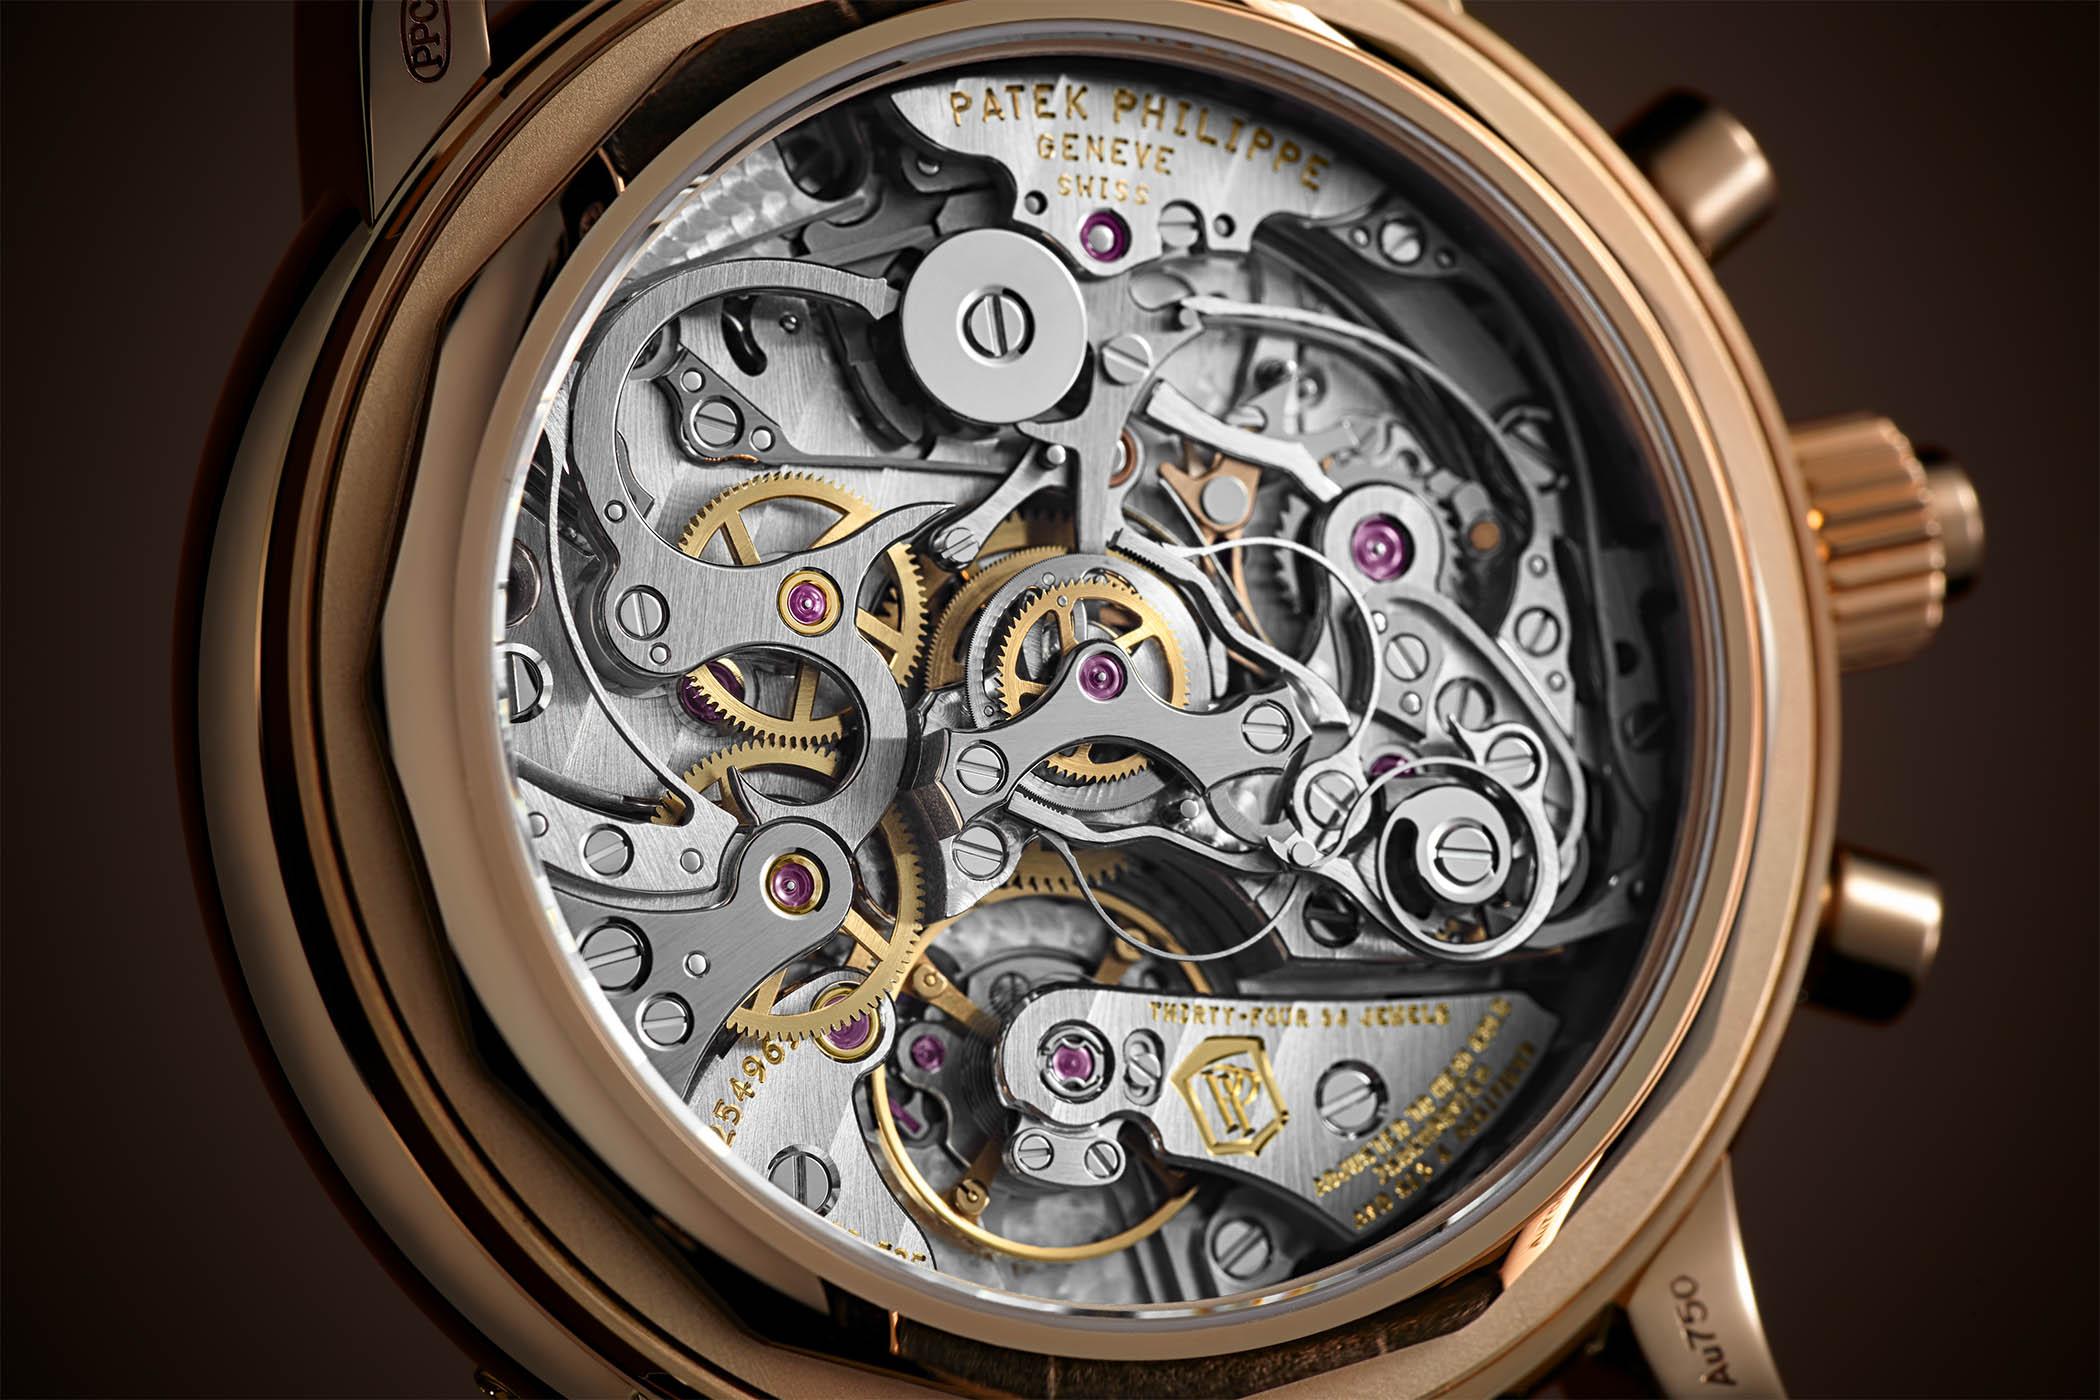 Patek Philippe 5204R-011 Split-Seconds Chronograph Perpetual Calendar slate grey